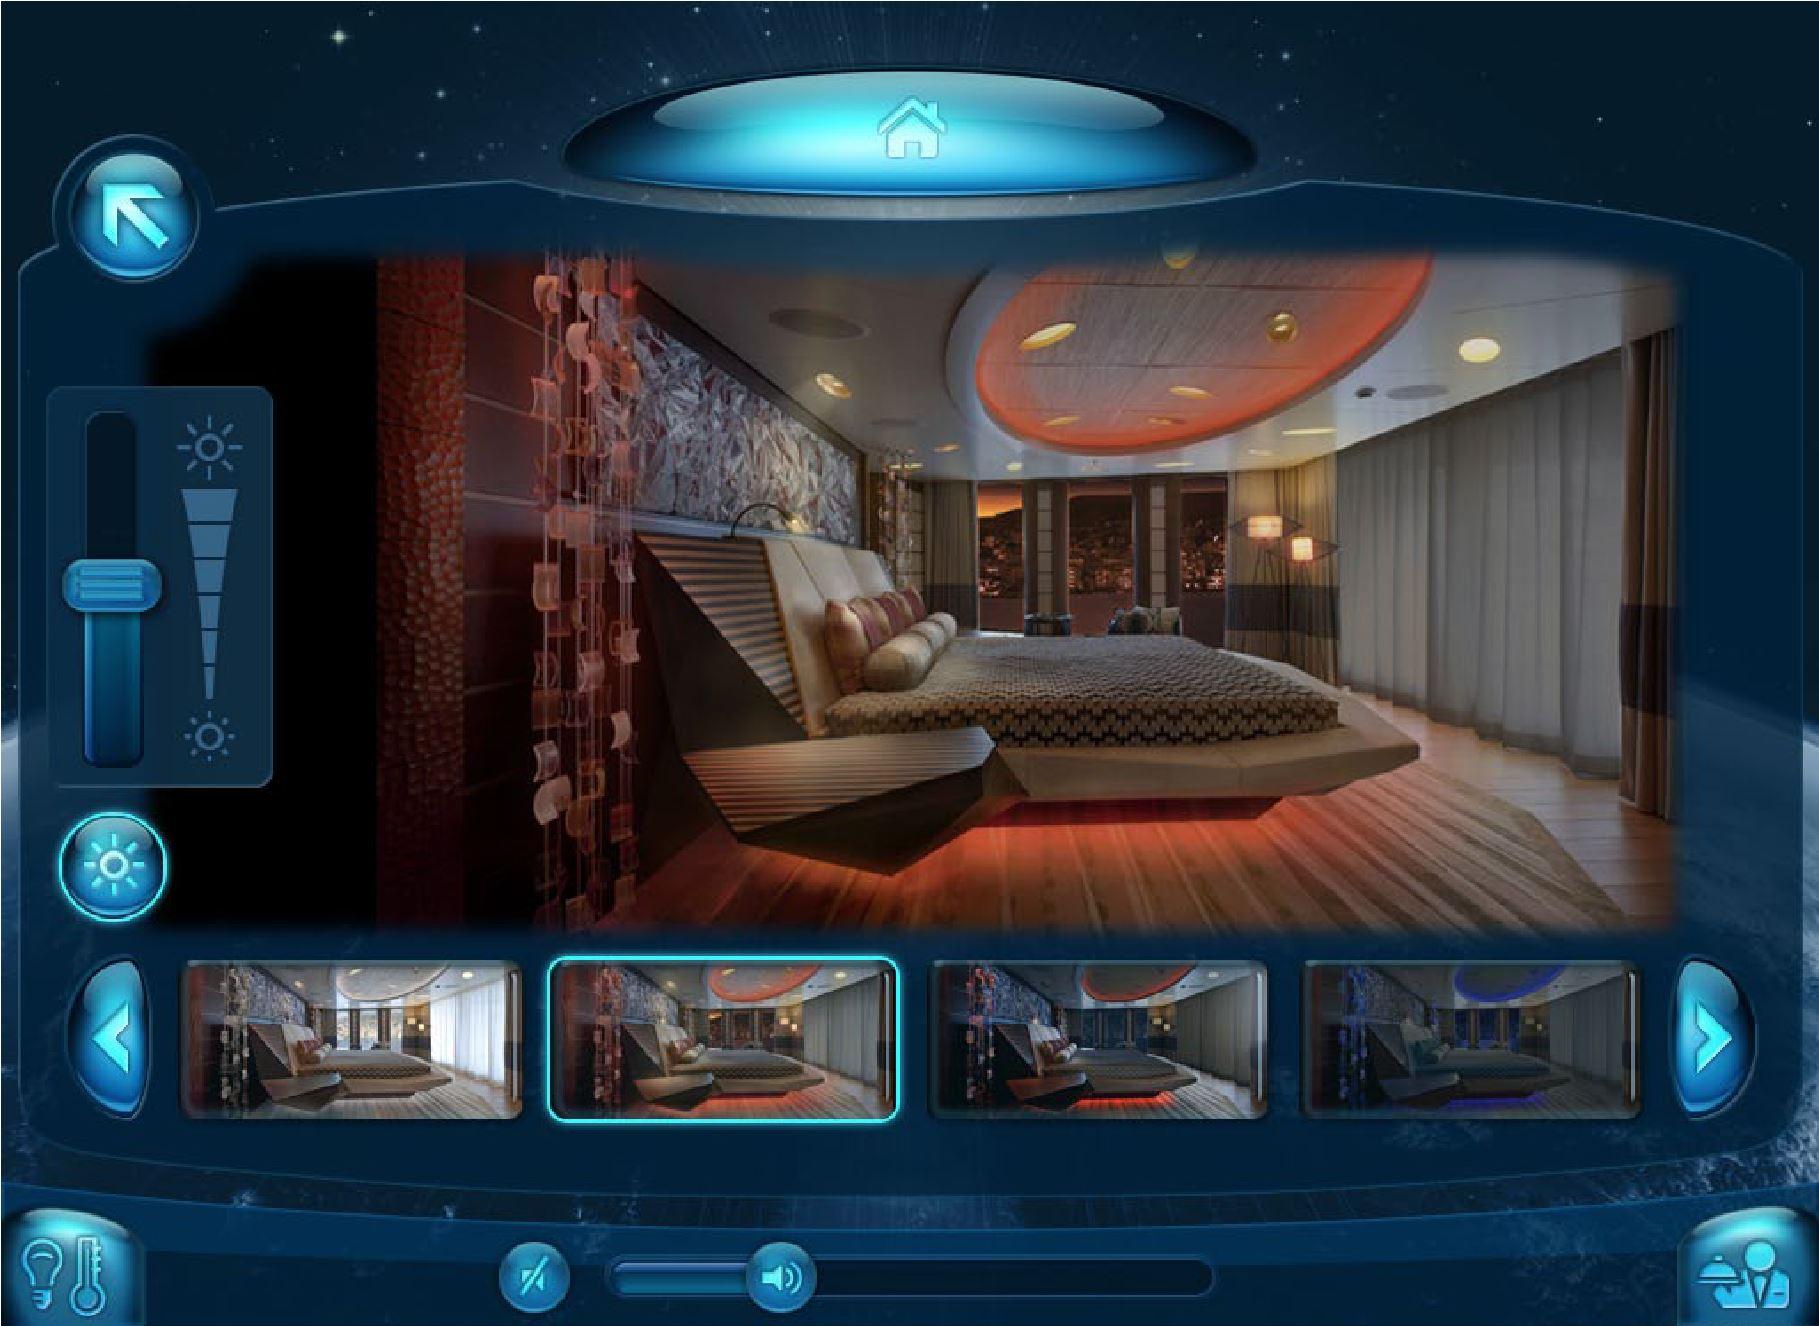 Individulual Room Control by Lighting Mood